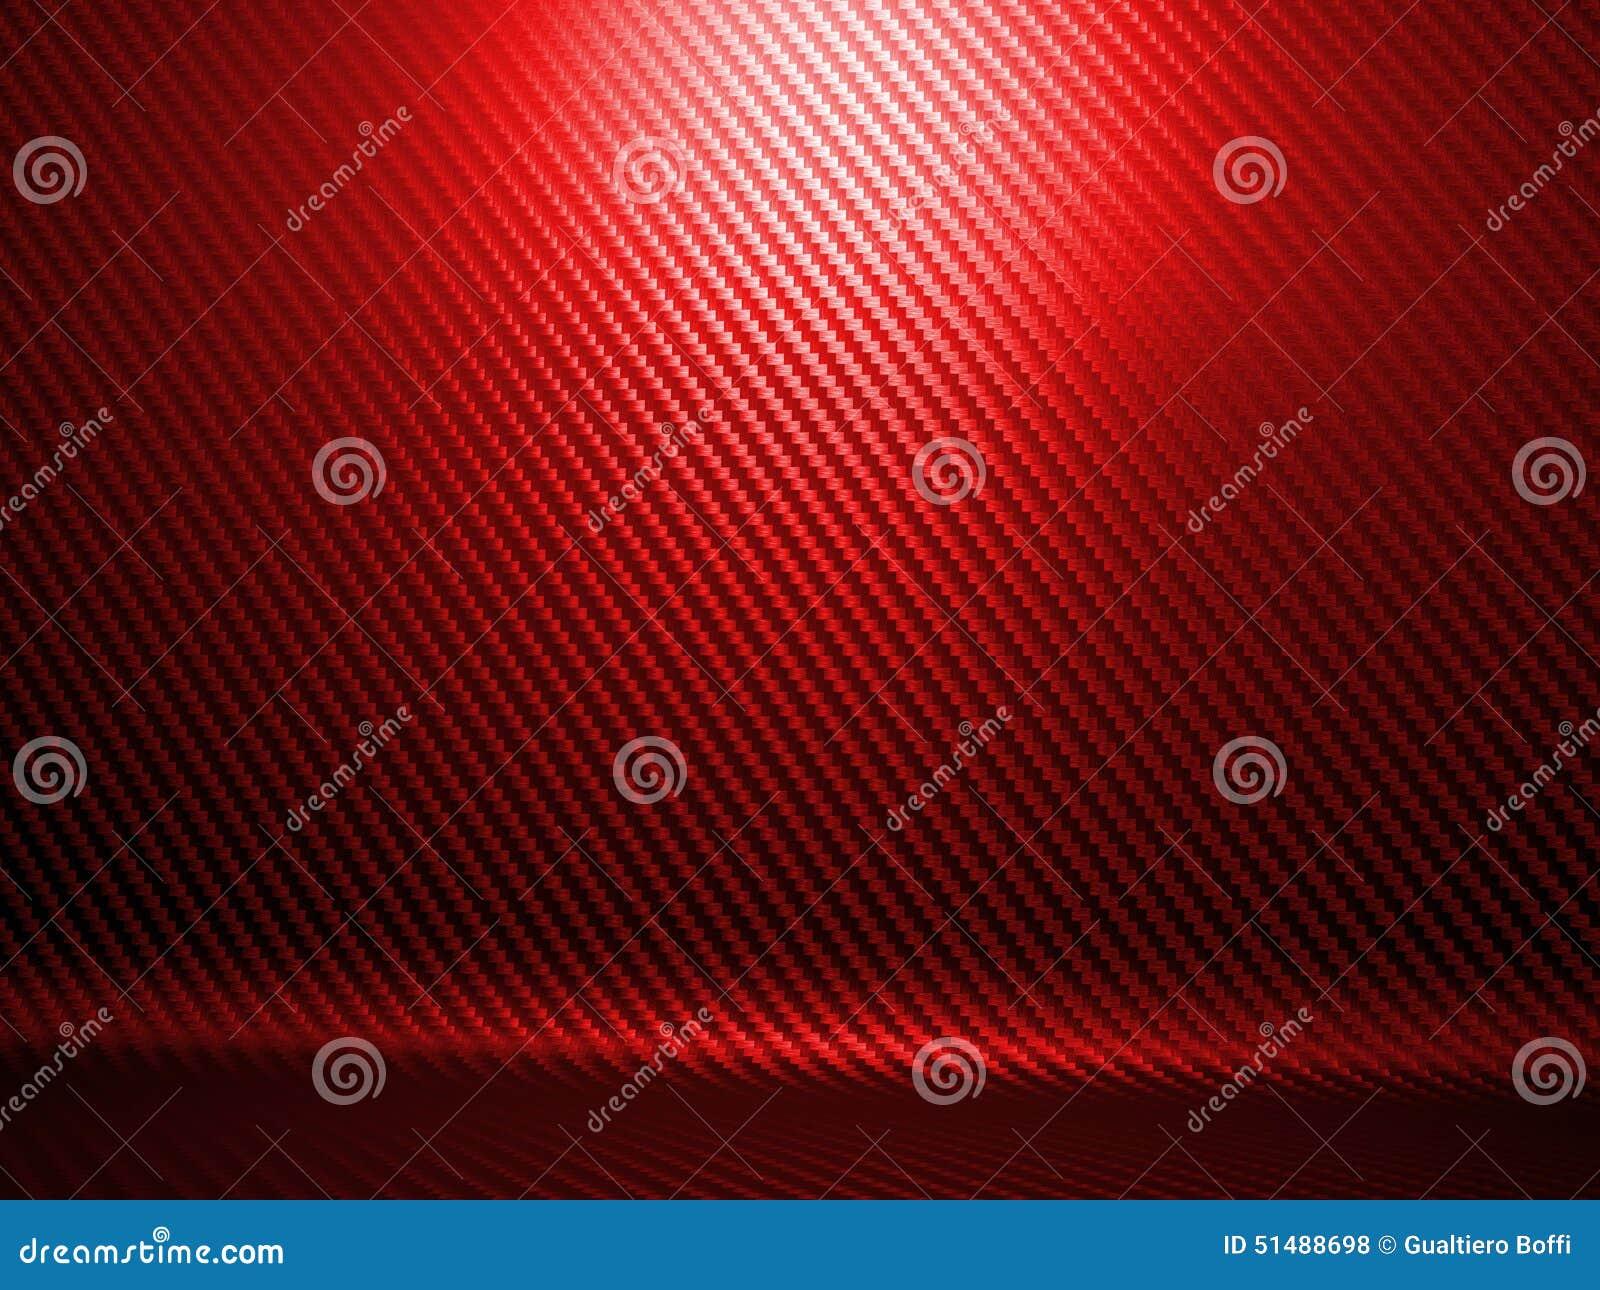 Carbon Background Stock Illustration - Image: 51488698